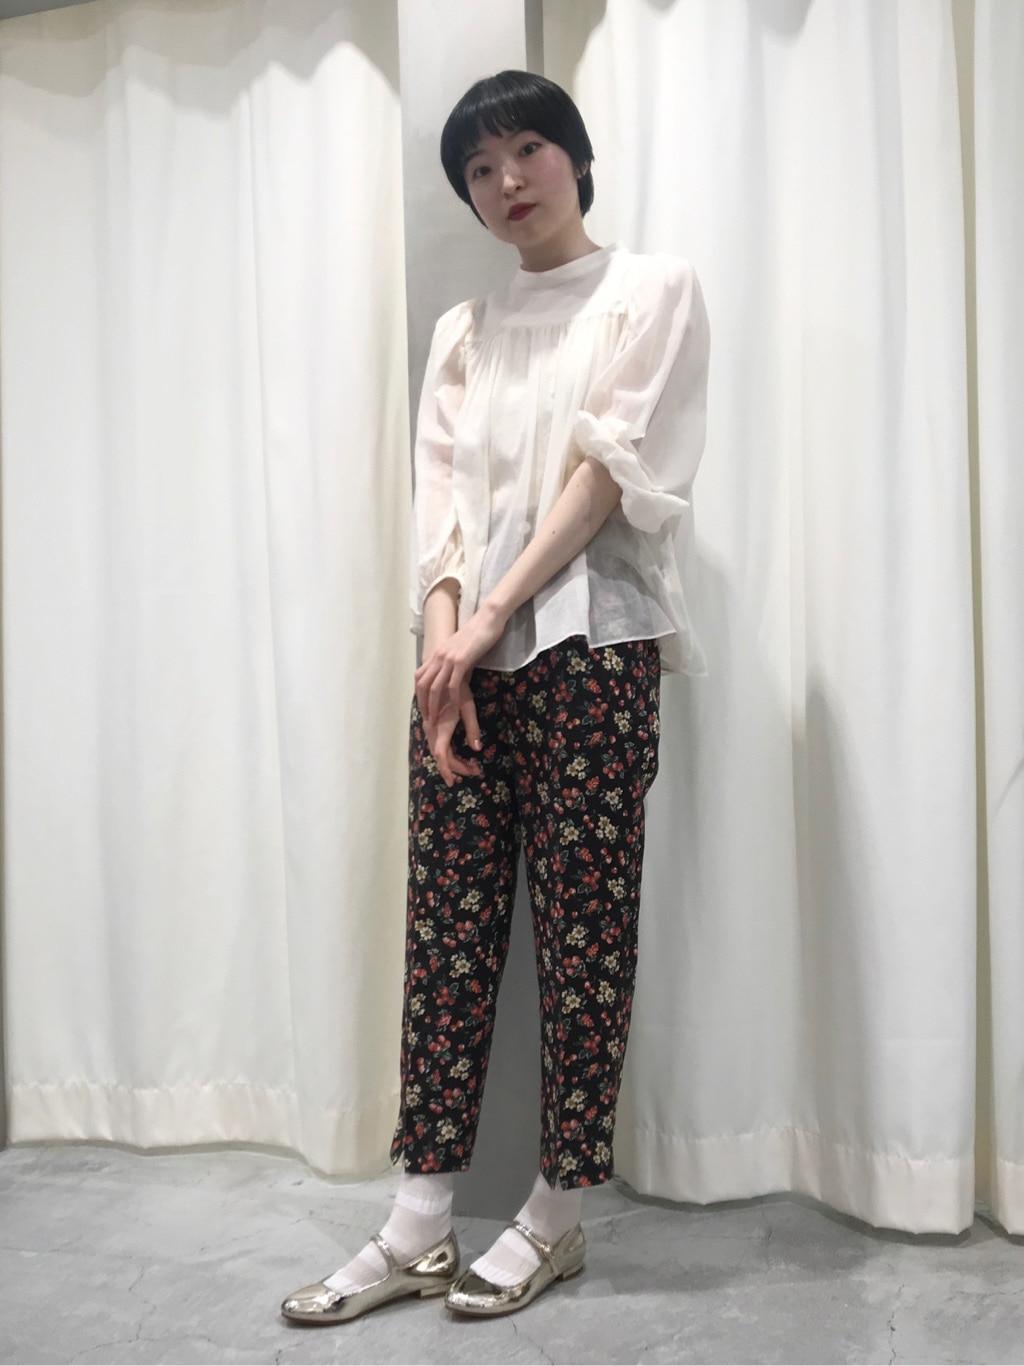 Dot and Stripes CHILD WOMAN ルミネ池袋 身長:163cm 2020.04.12